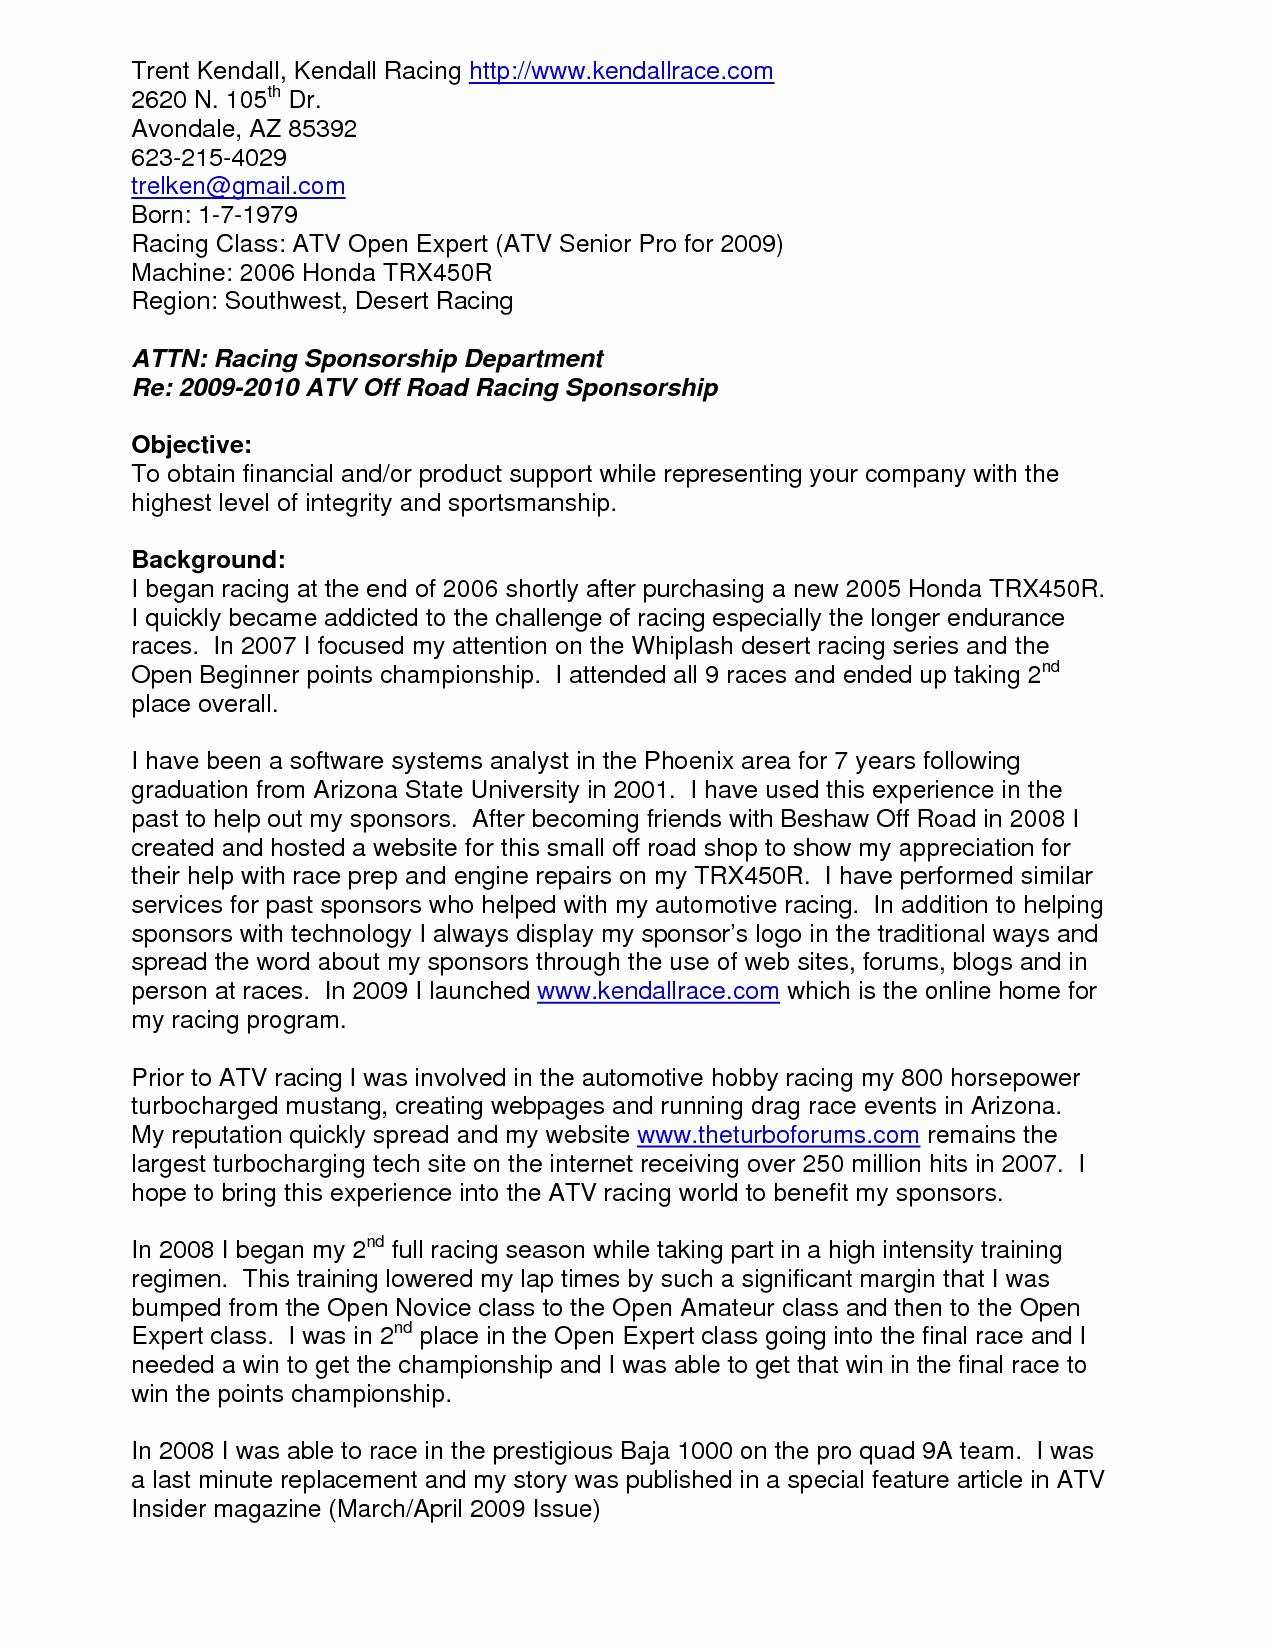 010 Background Proposal Sponsorship Best Of Essay Writing Sites Uk Top Companies Websites Full